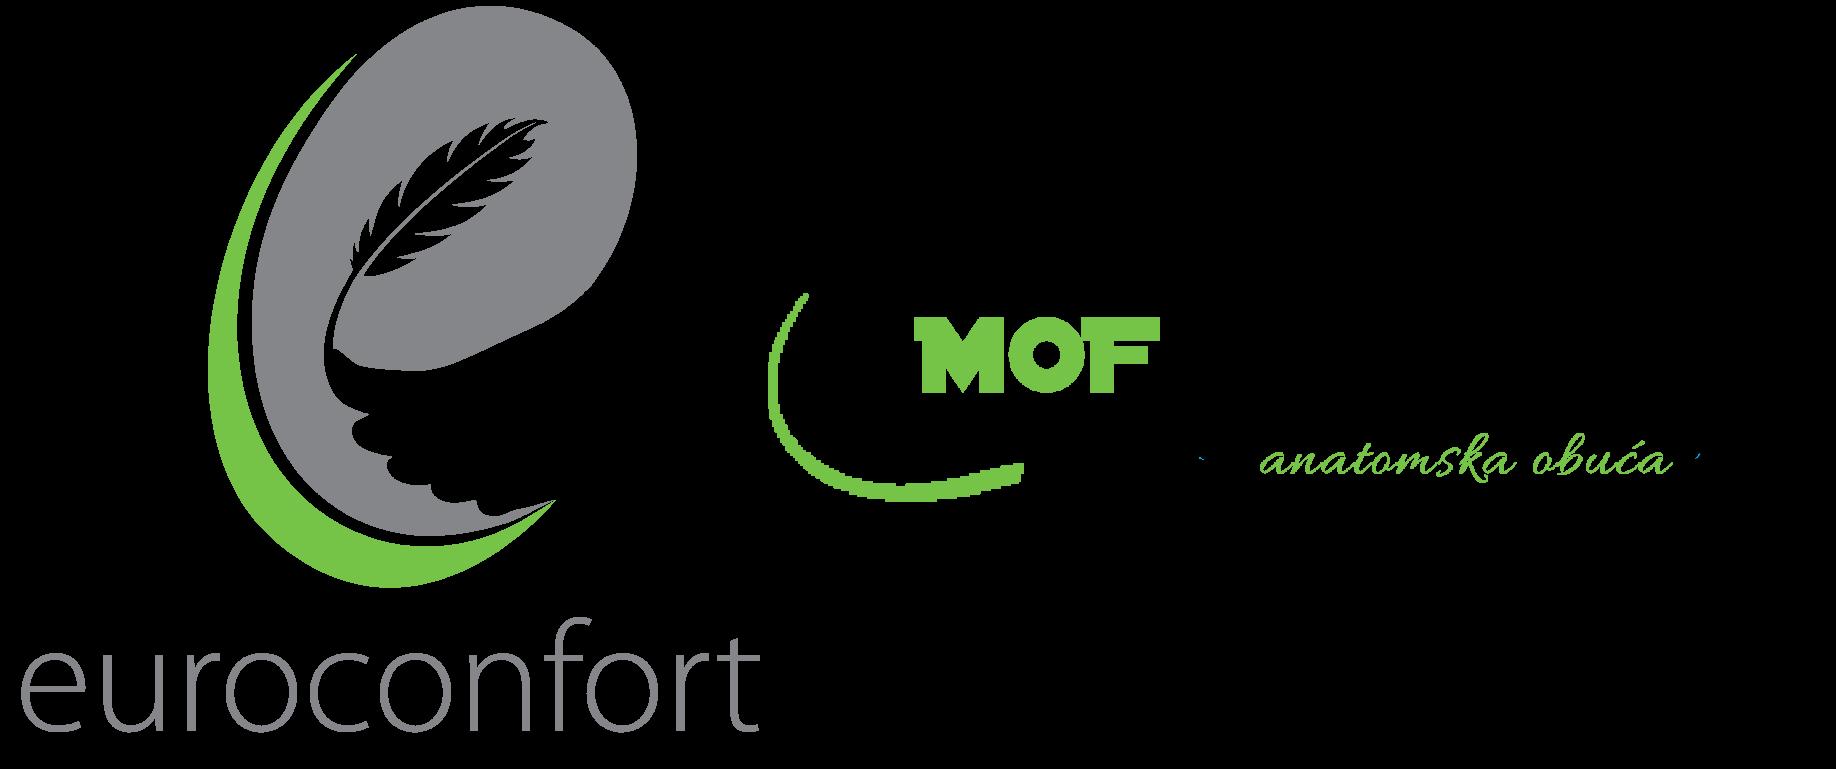 MOF Studio